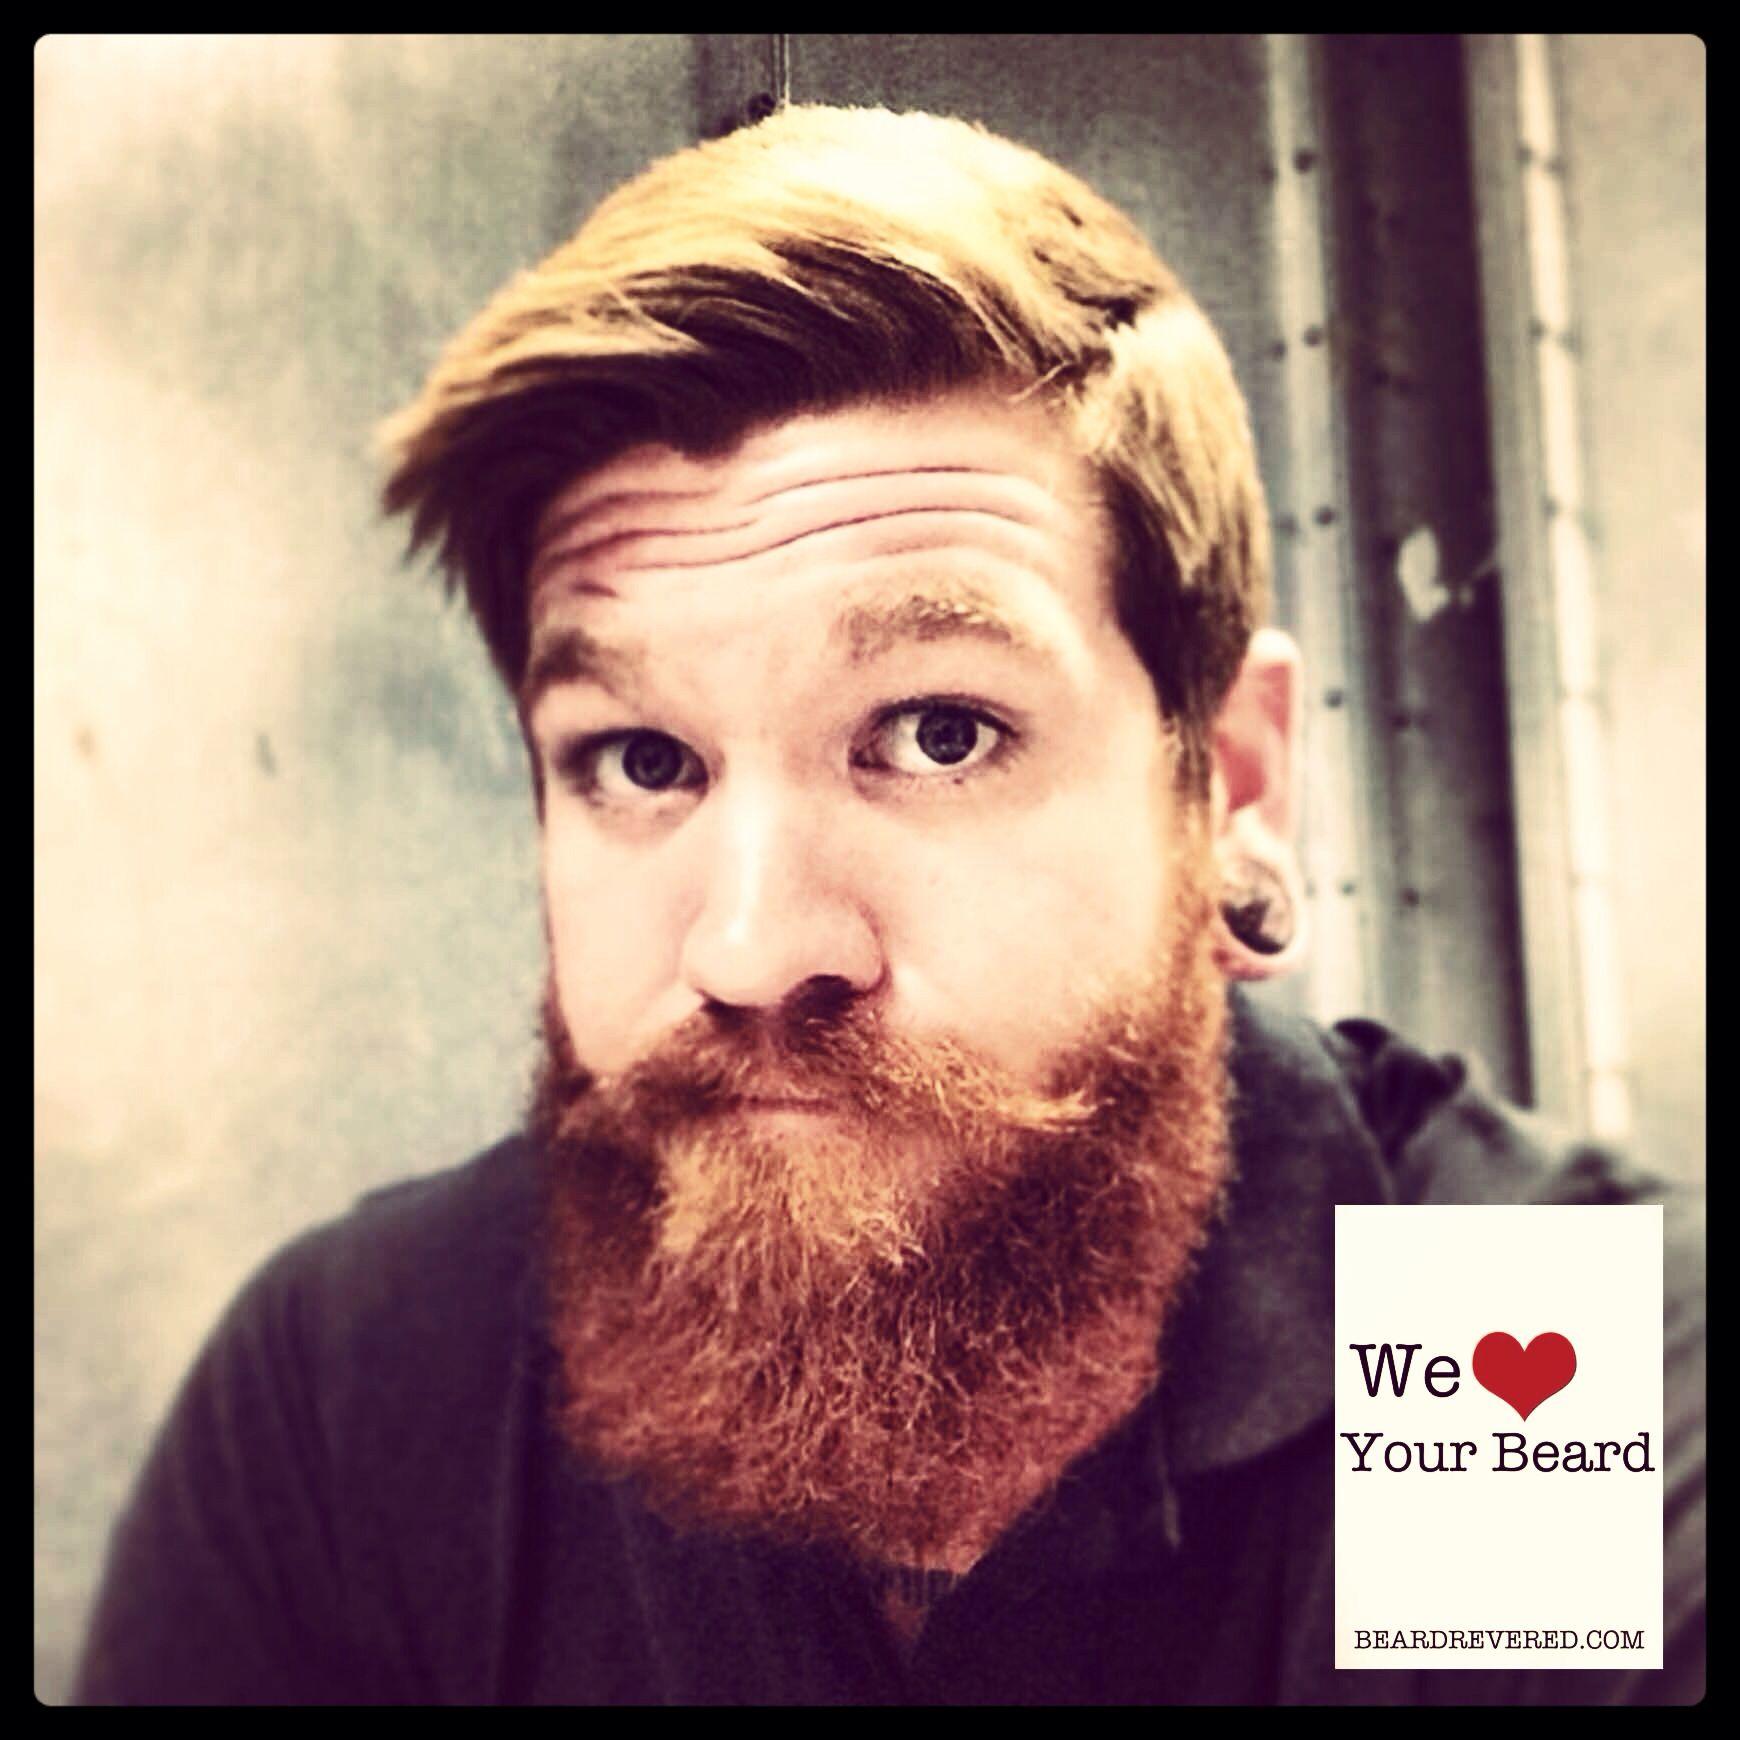 Redhead boy haircuts david banbury oxford beard beardrevered  we  your b e a r d